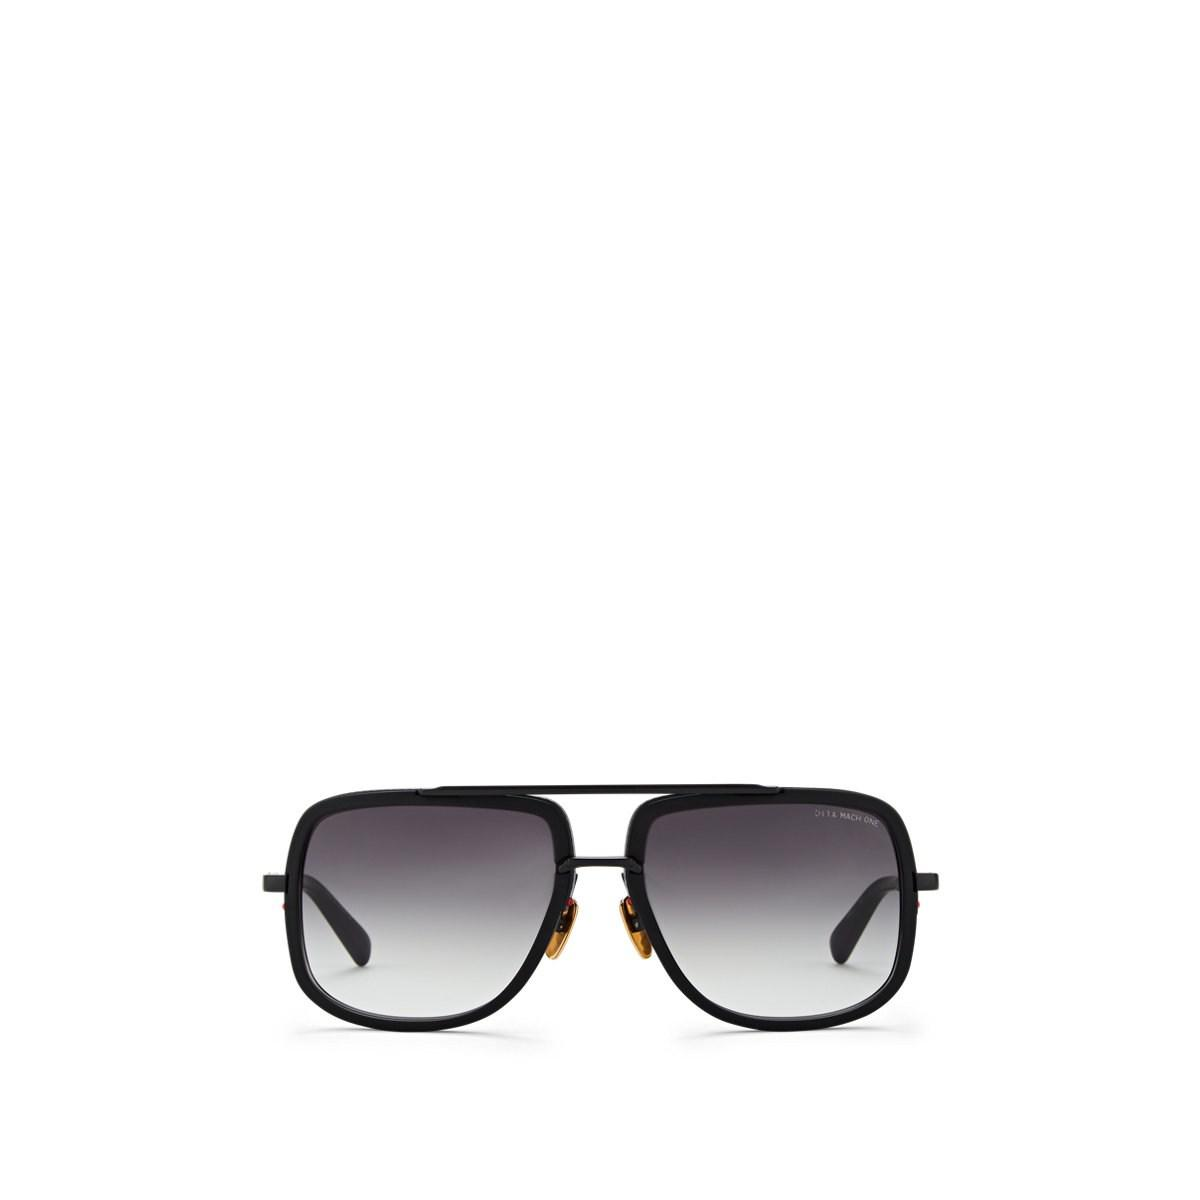 bdd25342b9f9 Dita Mach-one Sunglasses in Black for Men - Lyst